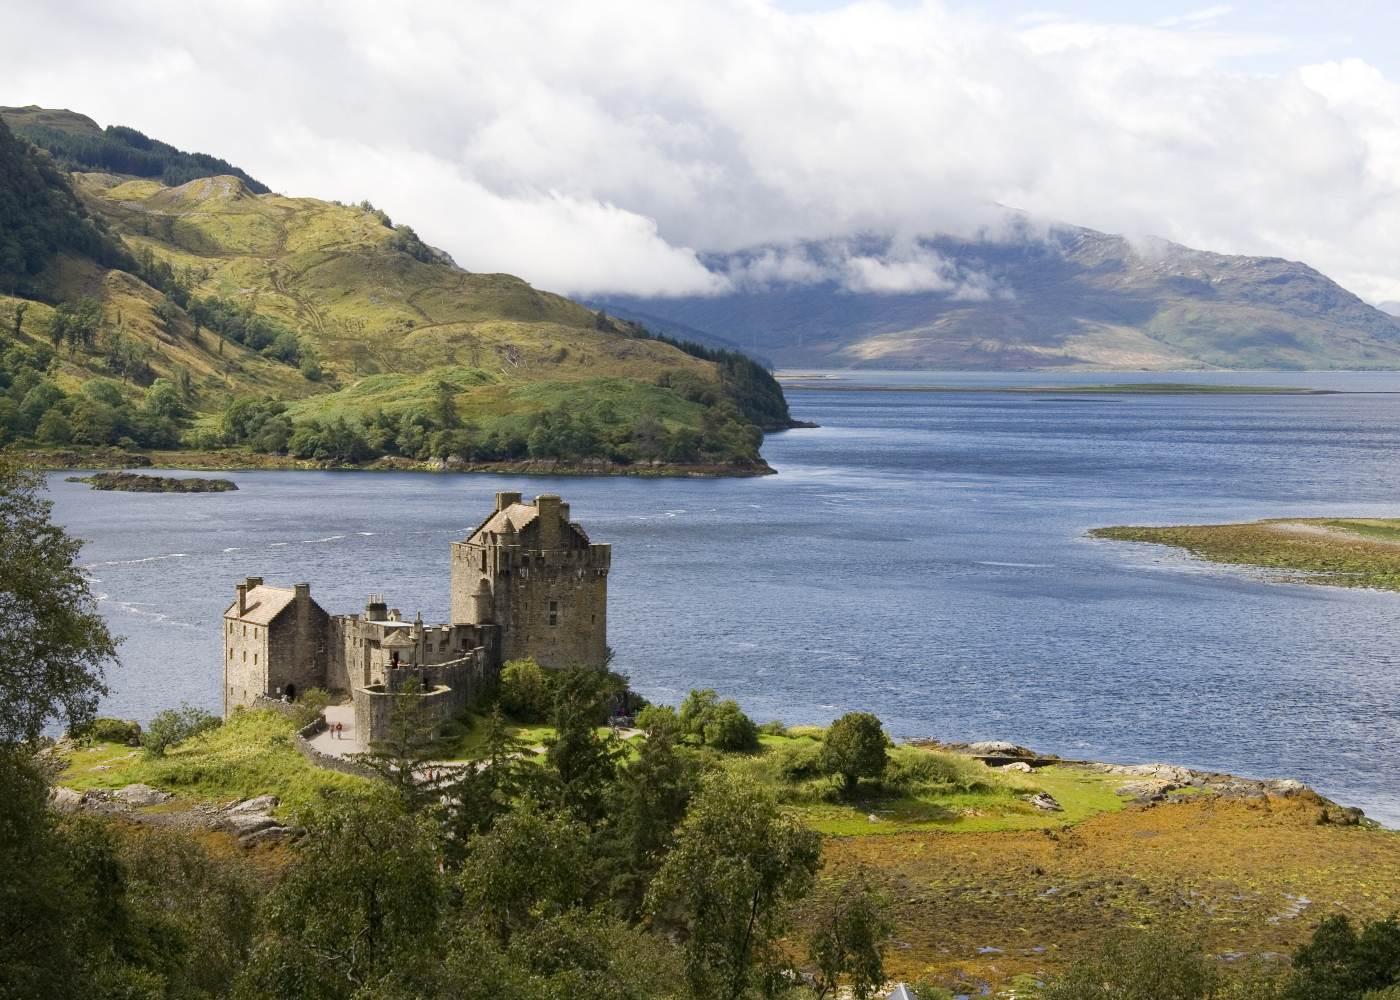 Vista das Terras Altas da Escócia